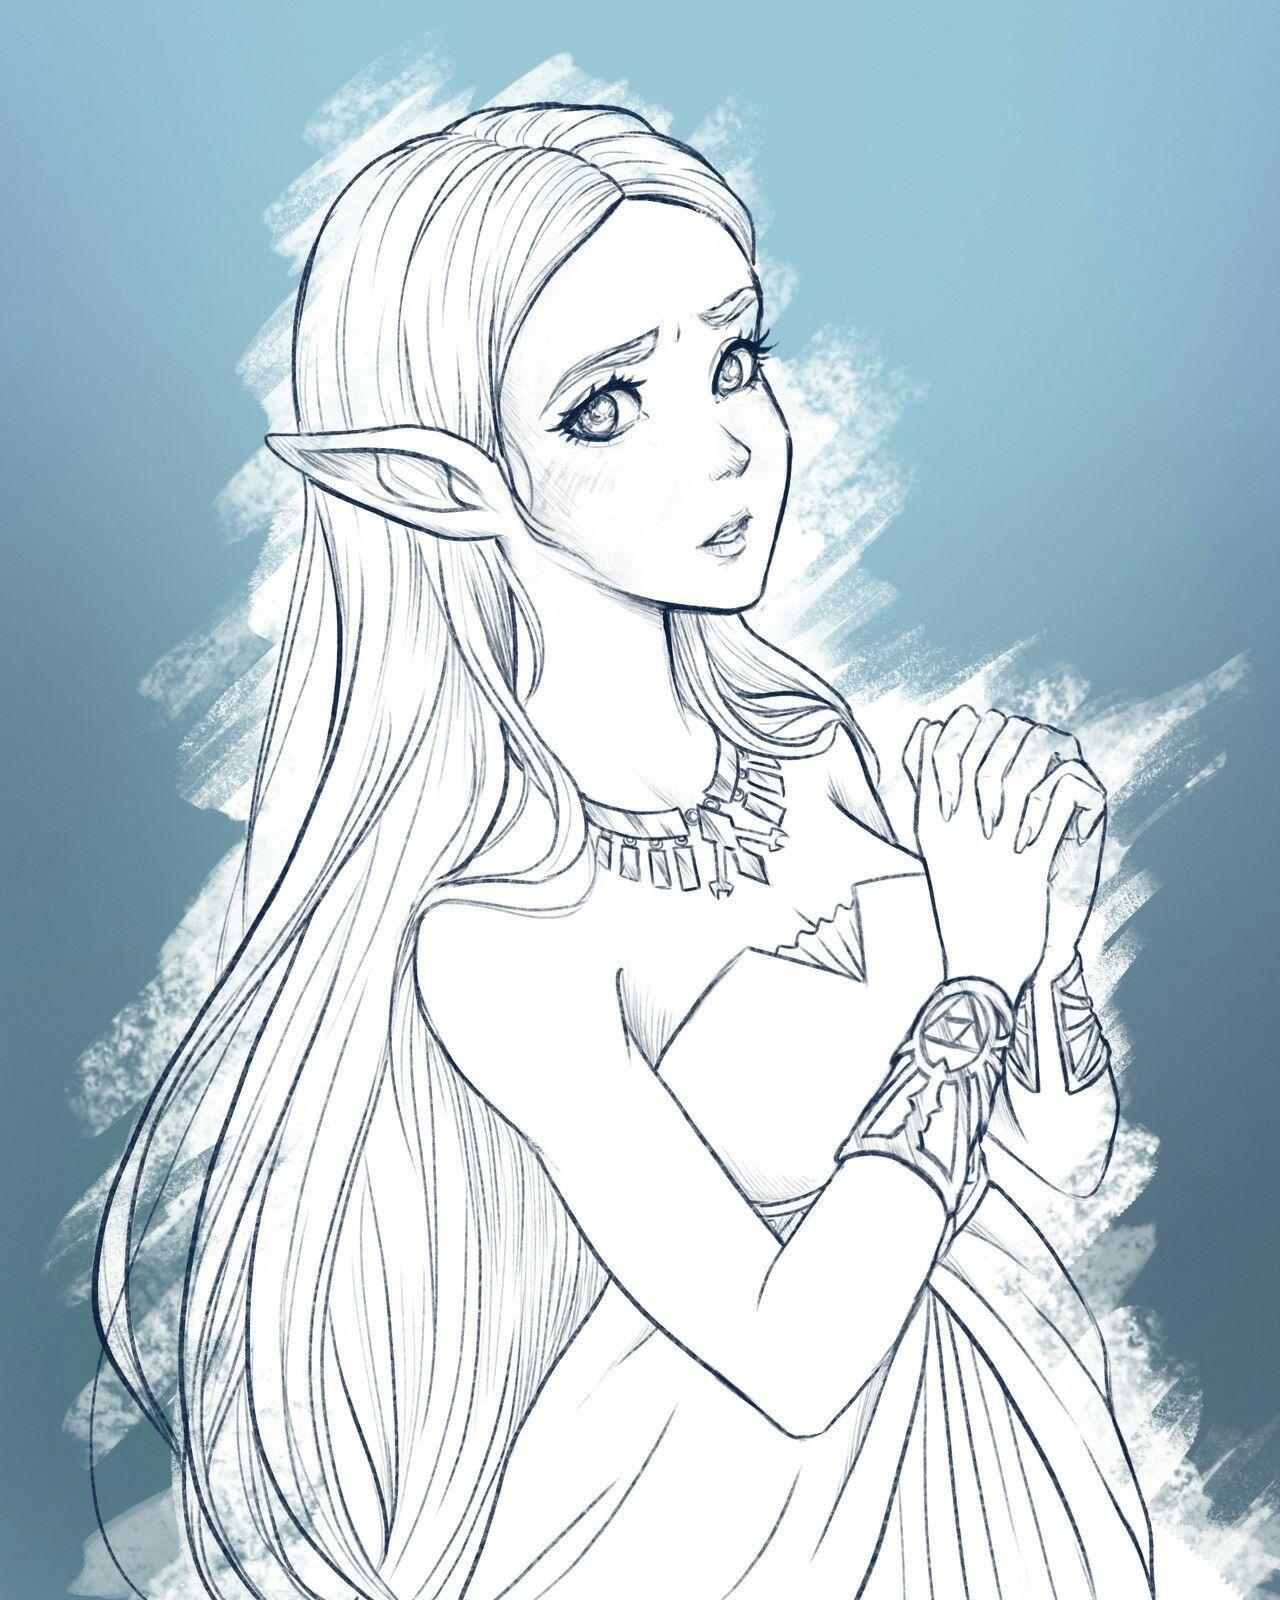 Link Zelda Dibujo A Lapiz